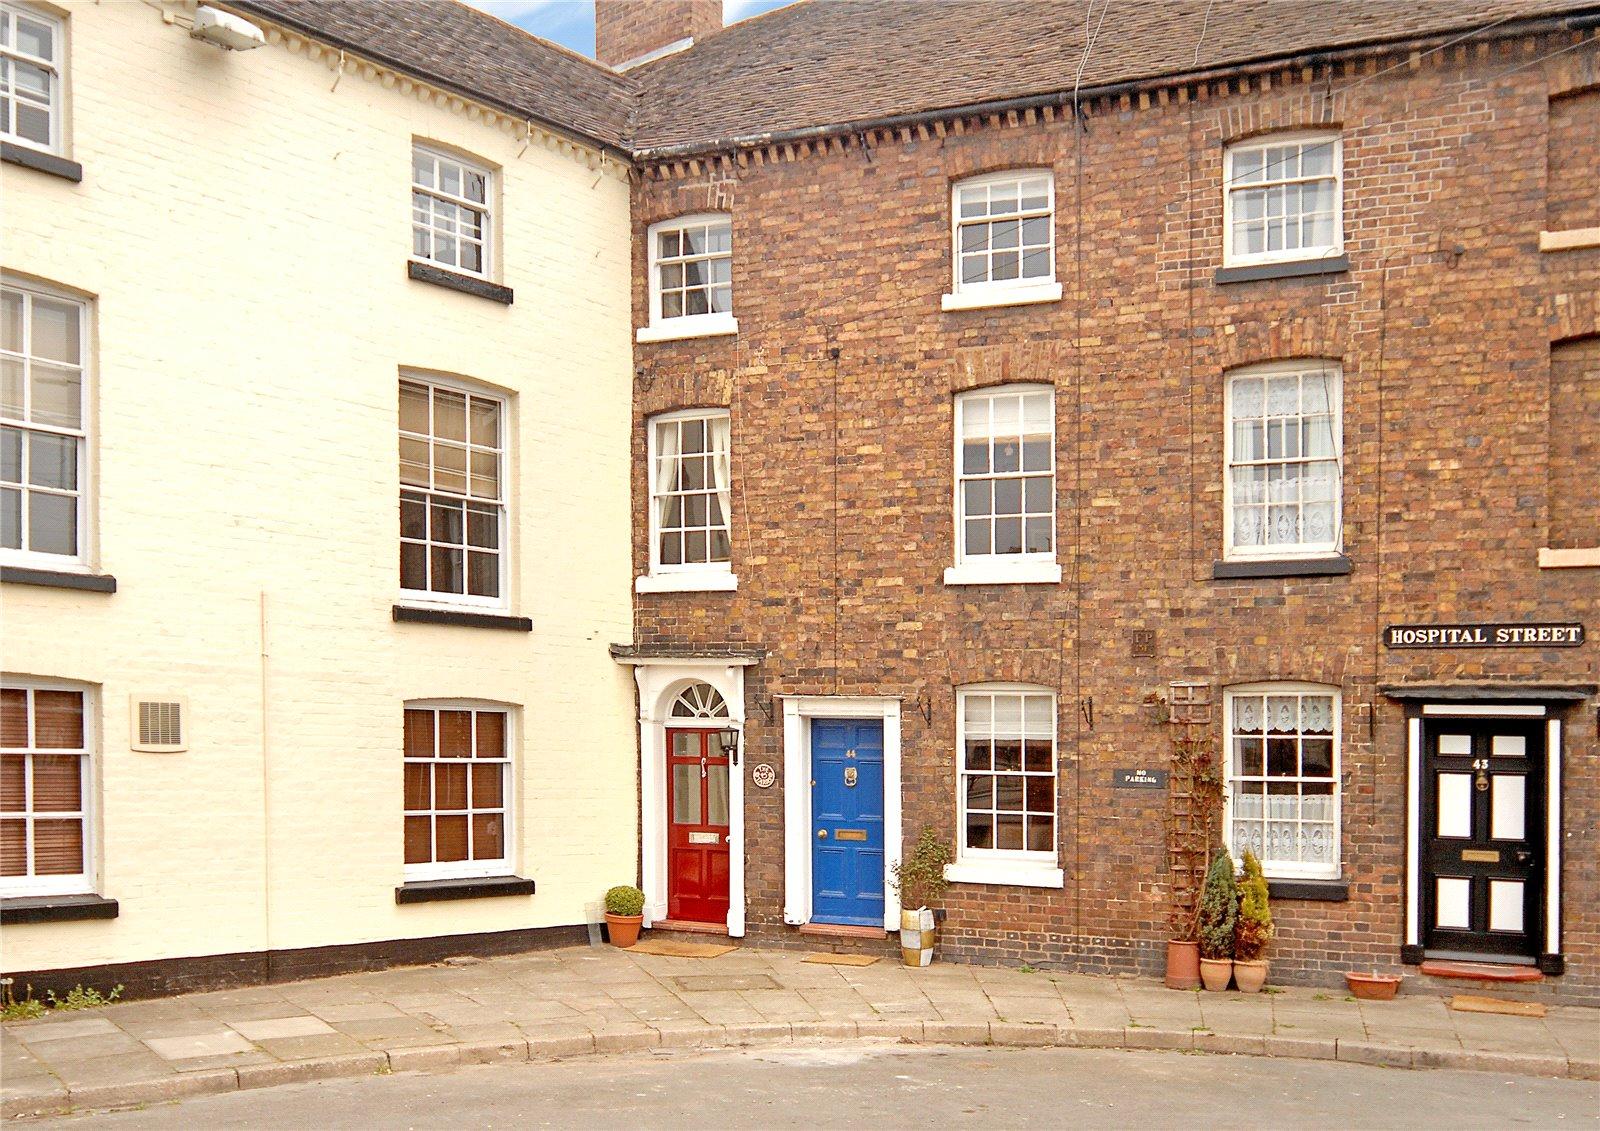 44 Hospital Street, Bridgnorth, Shropshire, WV15